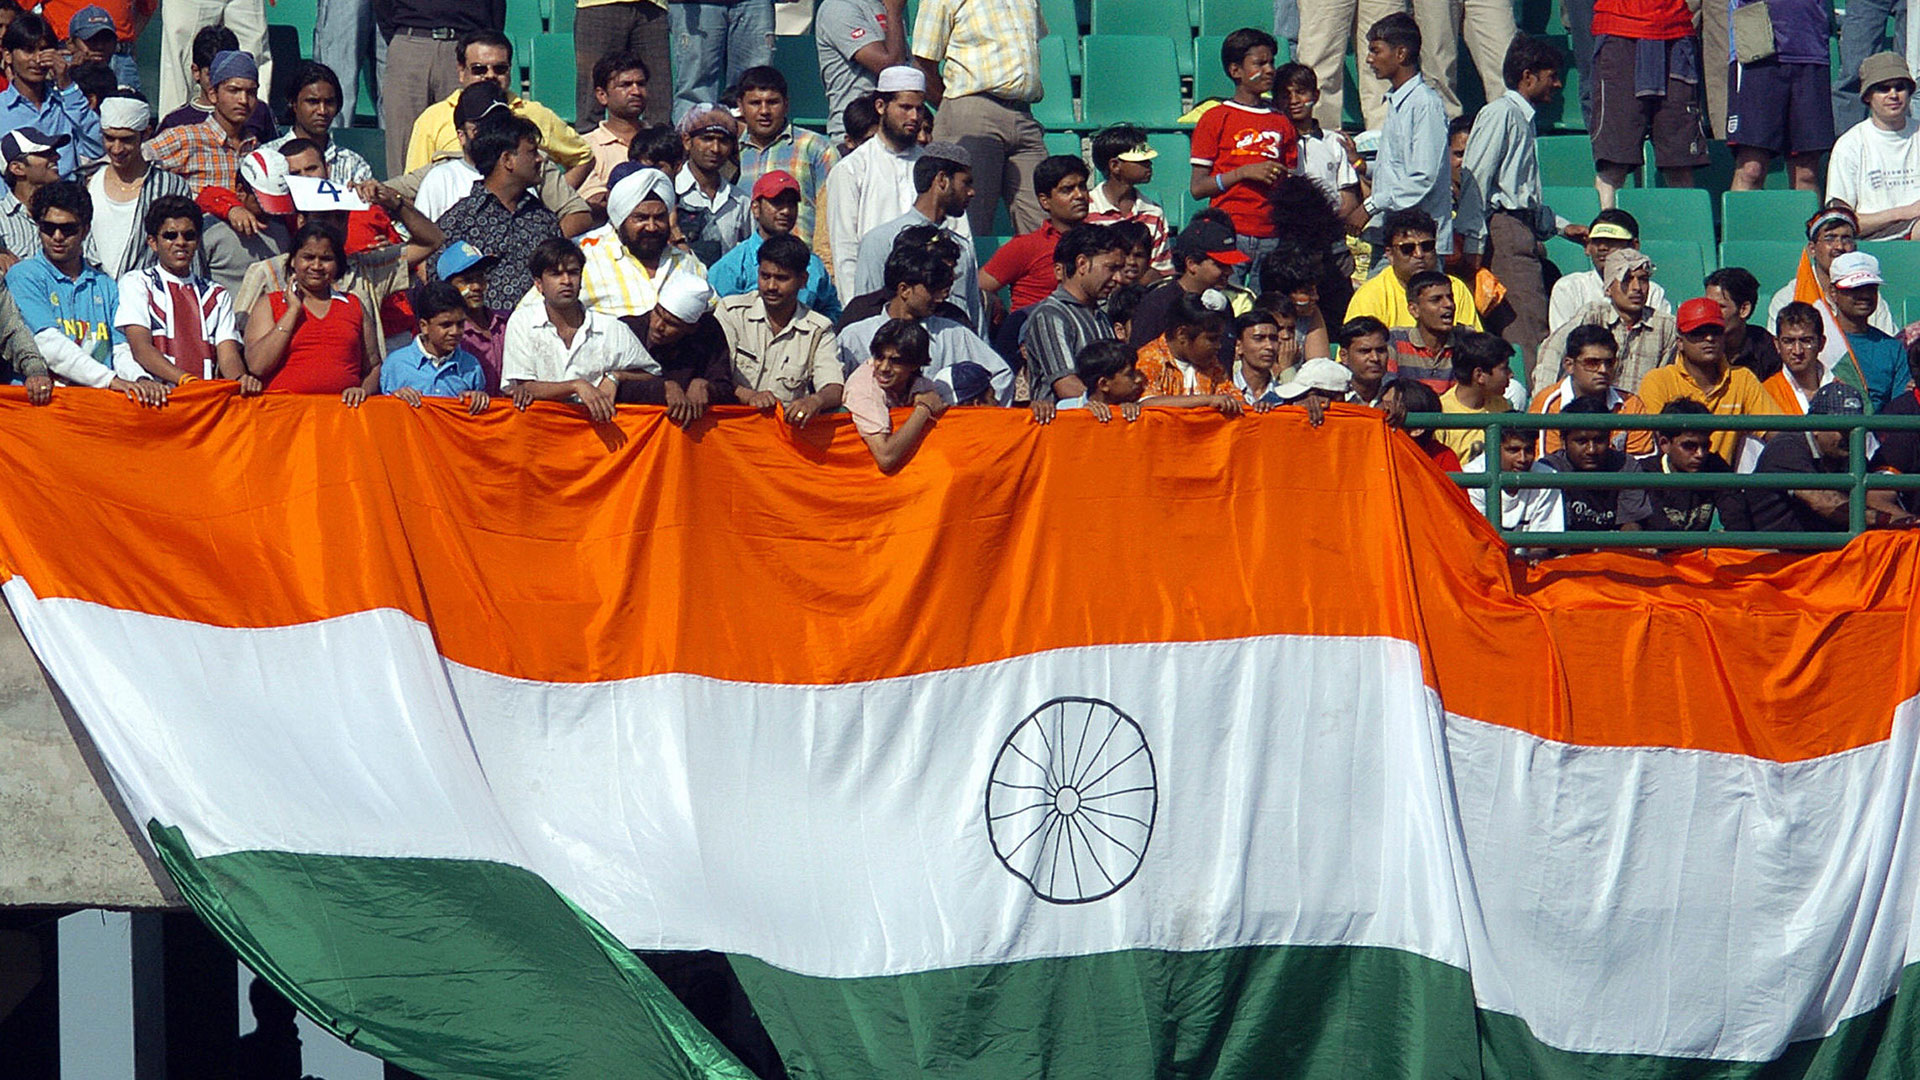 Indian Cricket Match